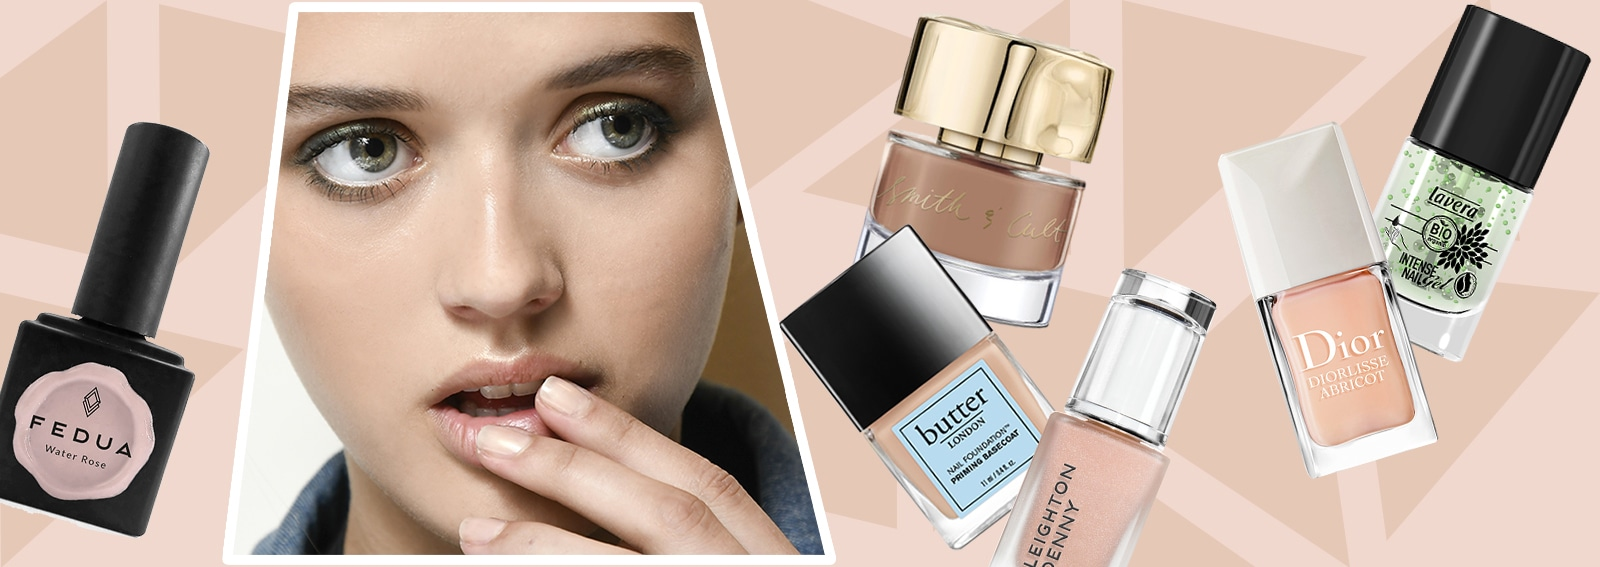 Mannequin manicure: il trend nude look sulle unghie